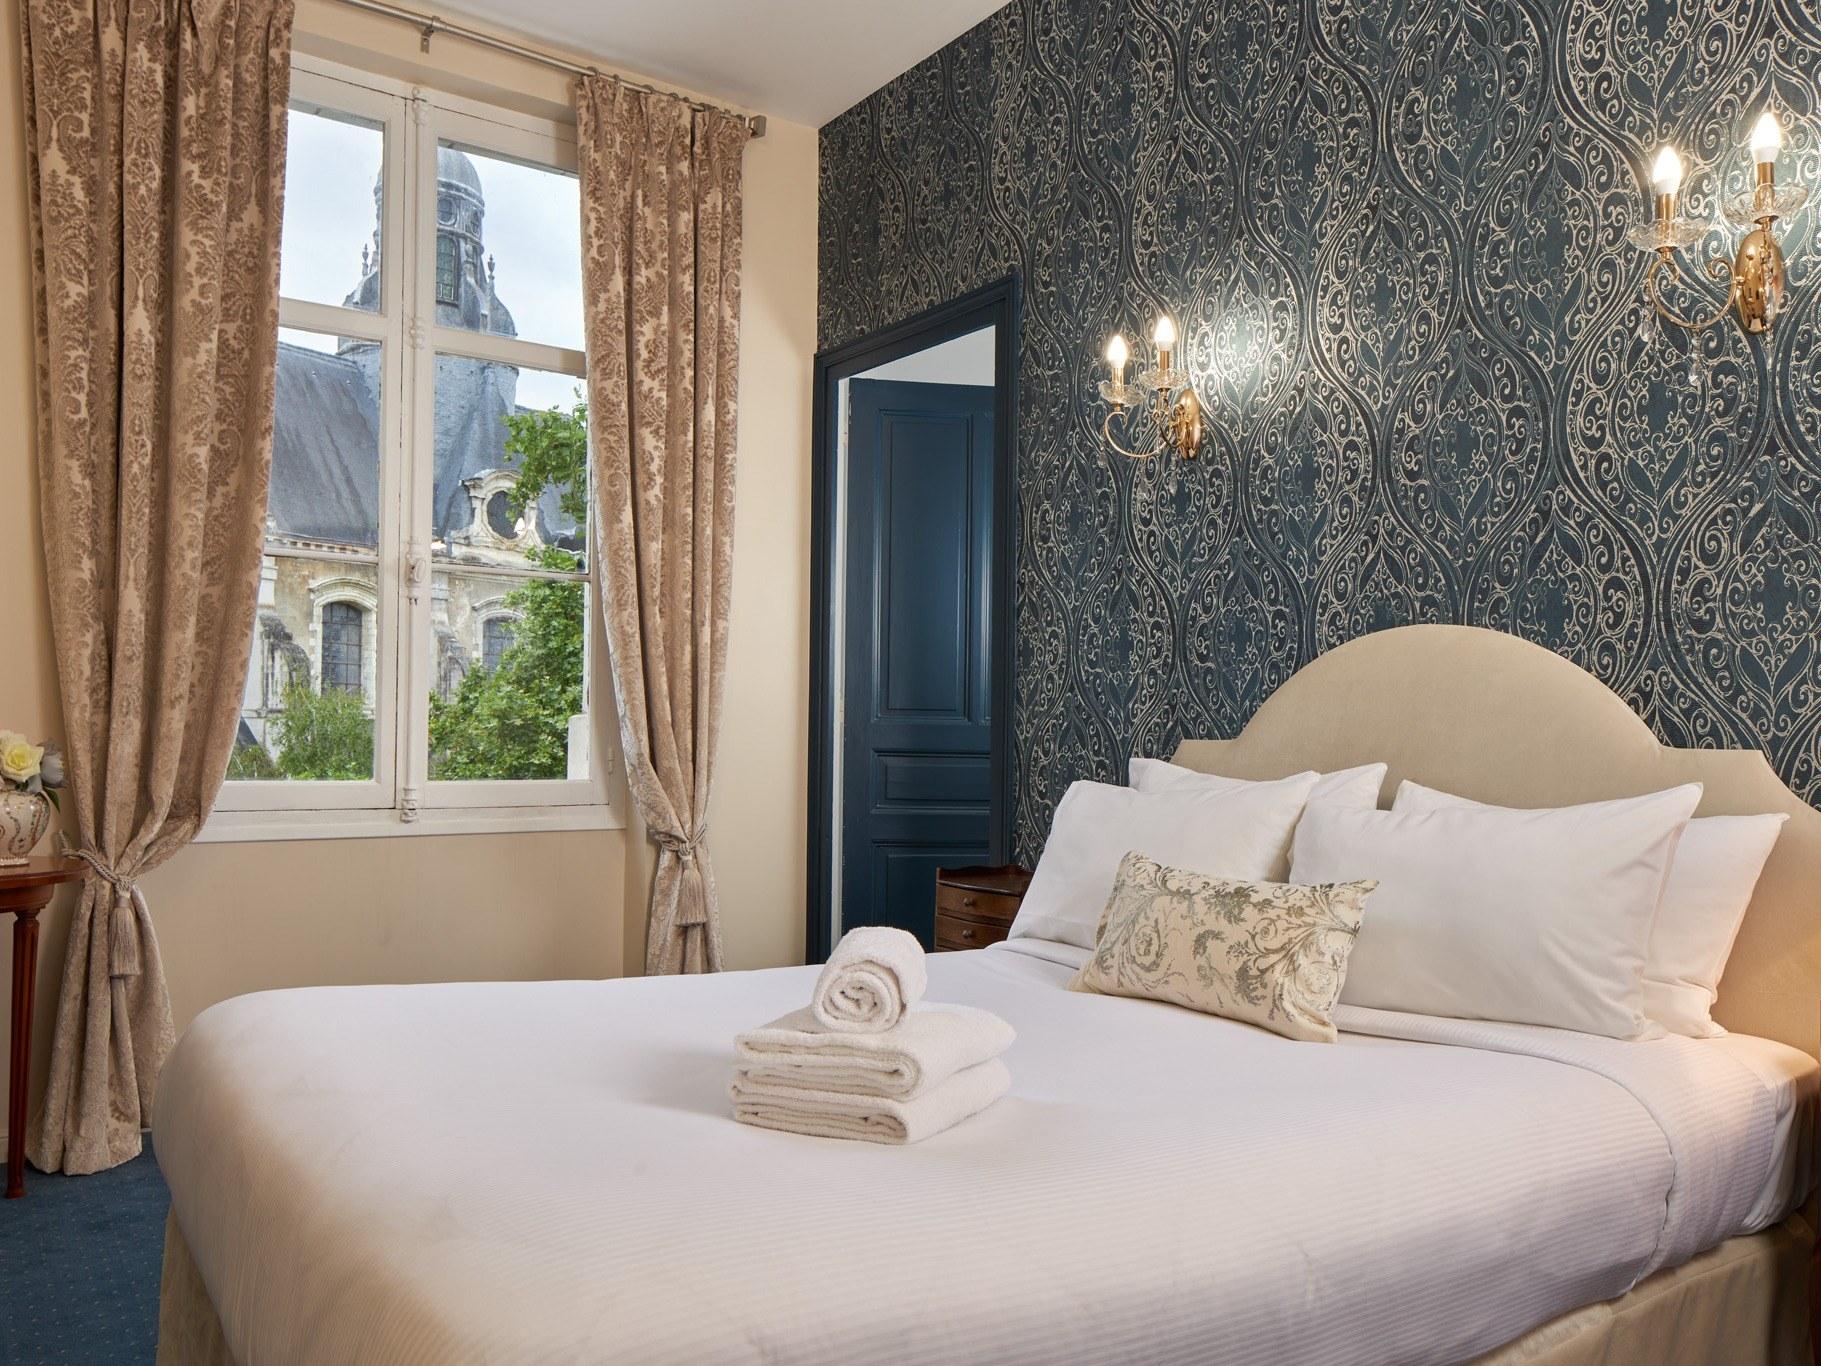 Hotel-Blois-chambre-triple